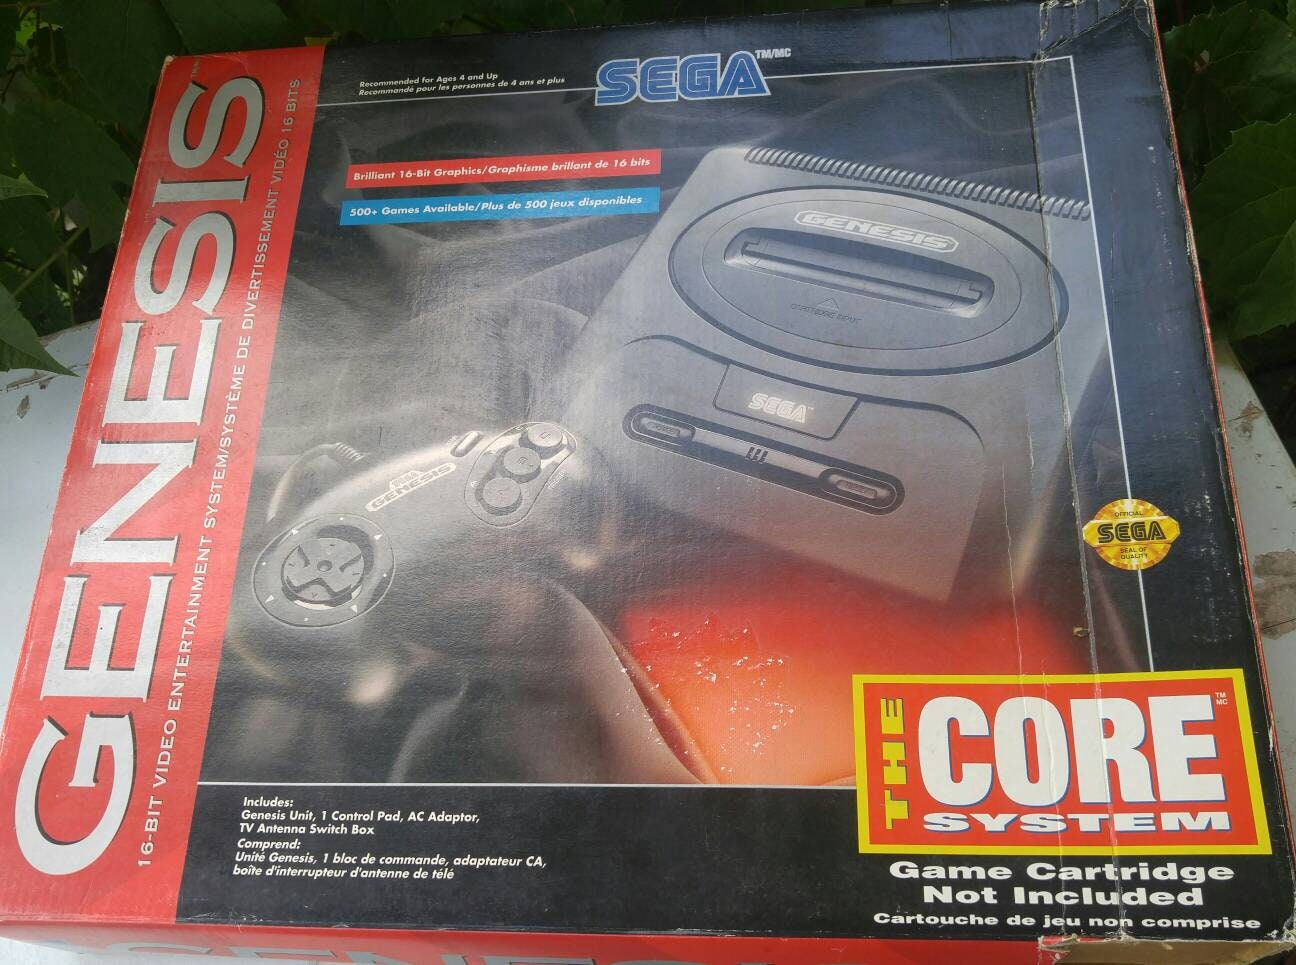 SEGA GENESIS 2 video game console